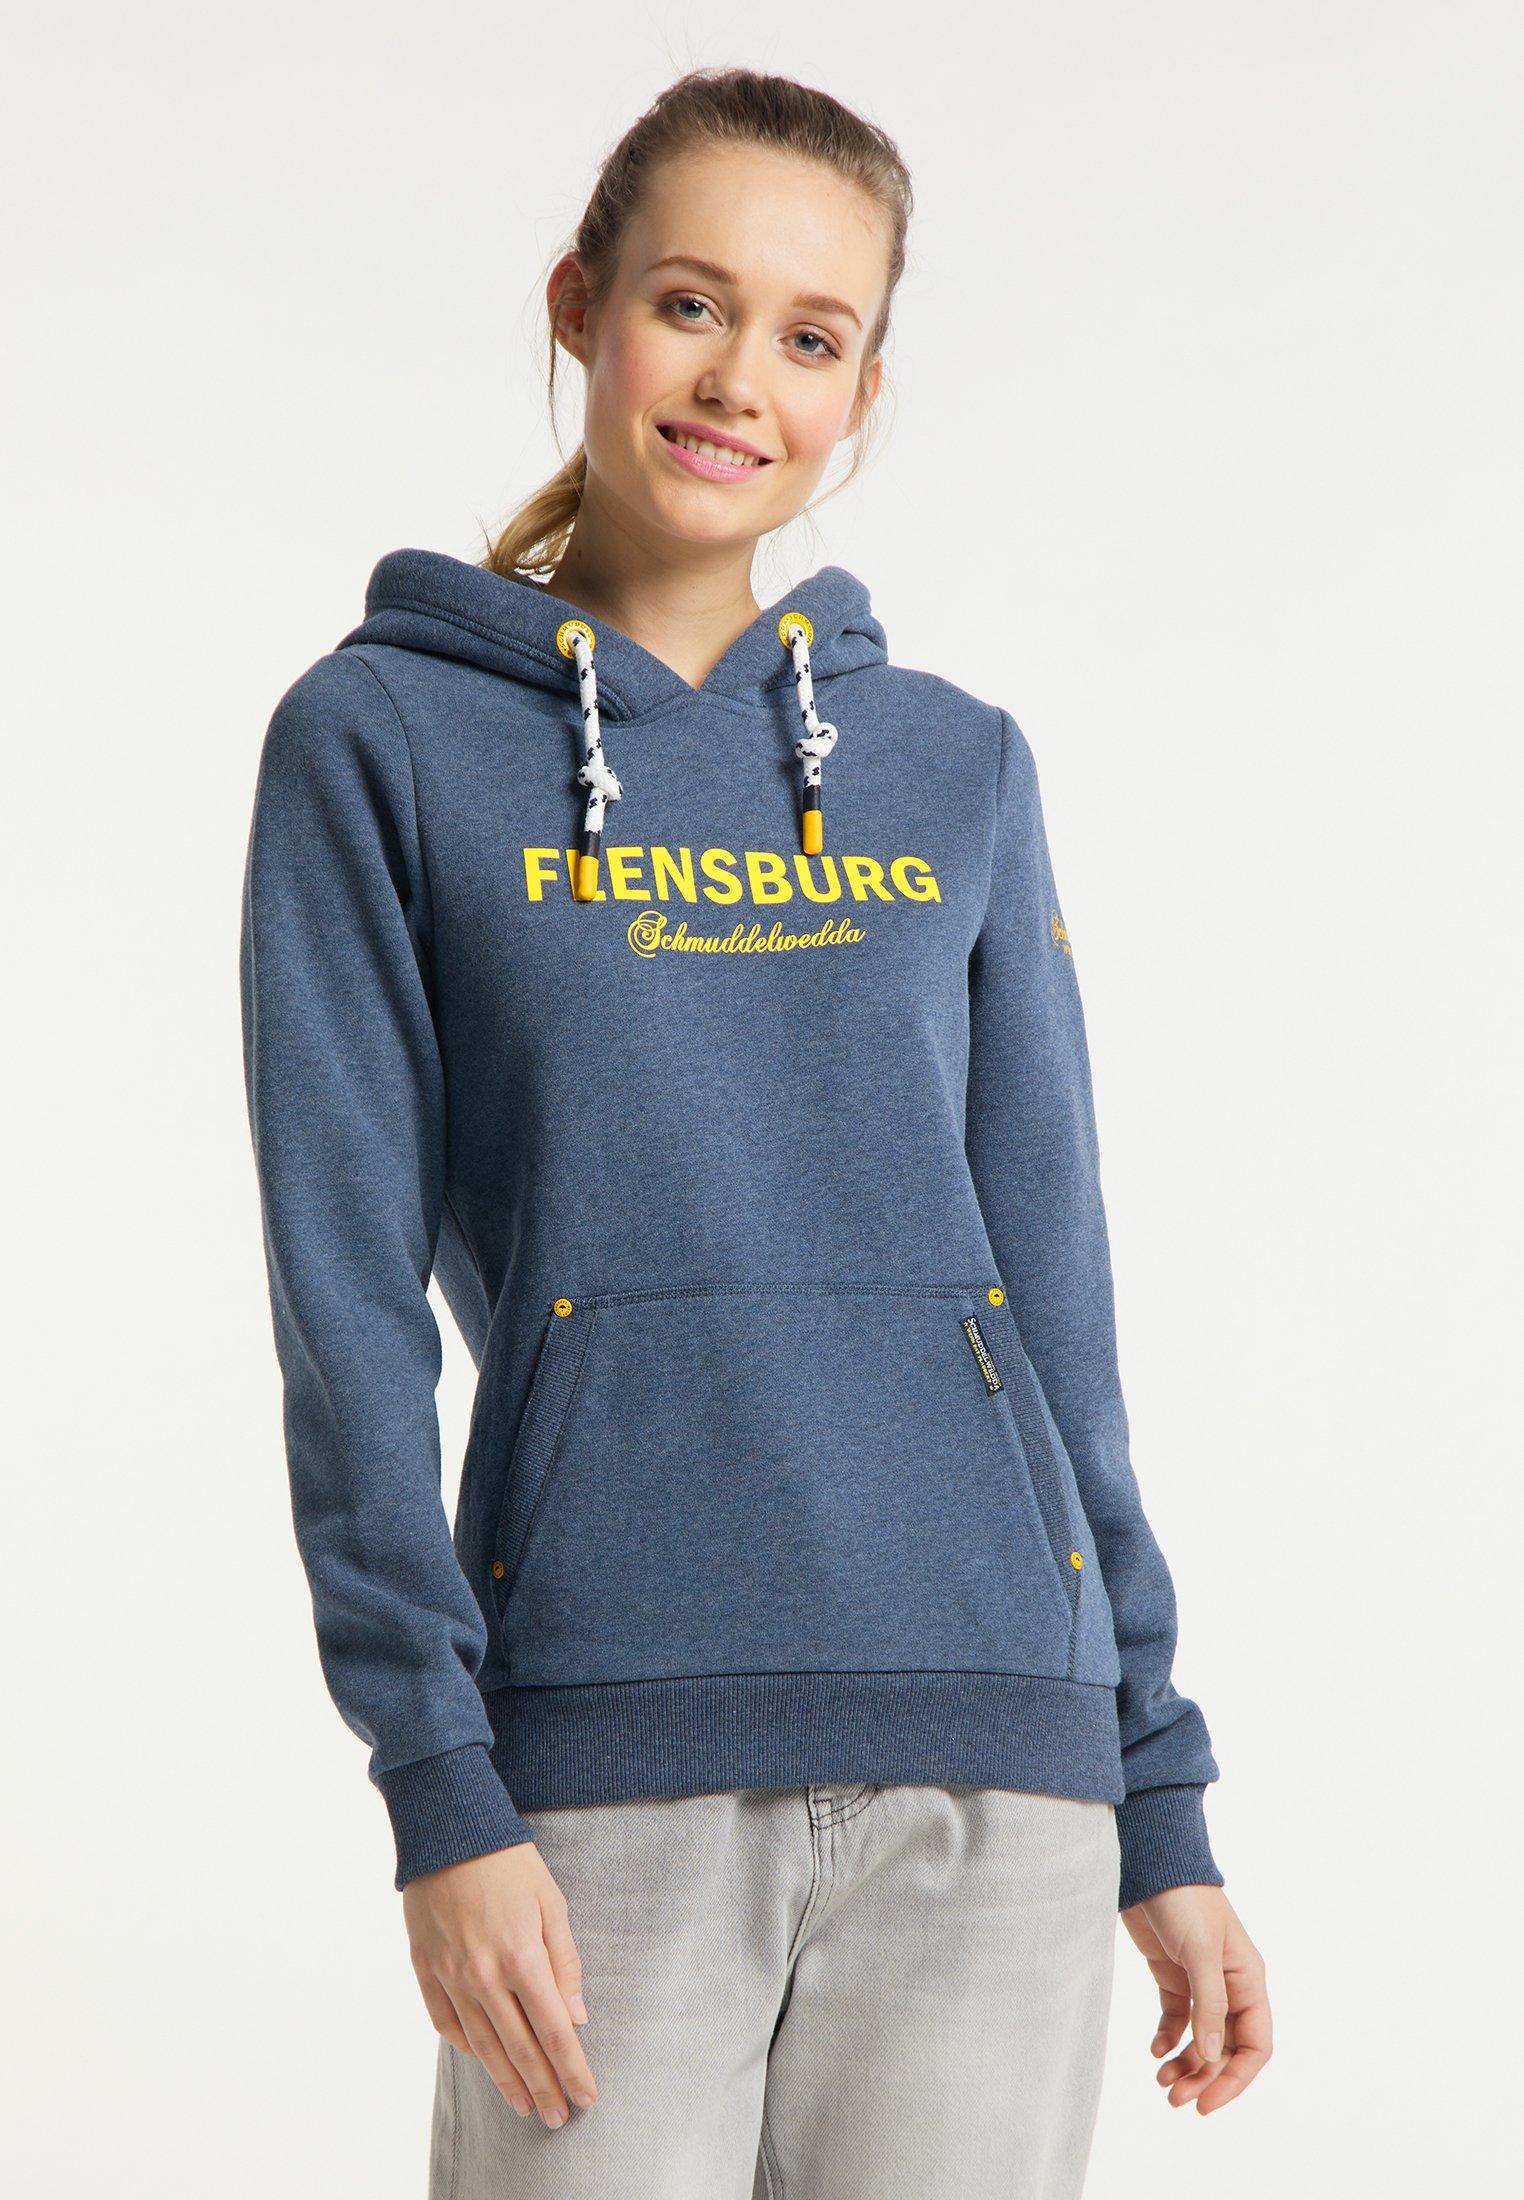 Donna FLENSBURG - Felpa con cappuccio